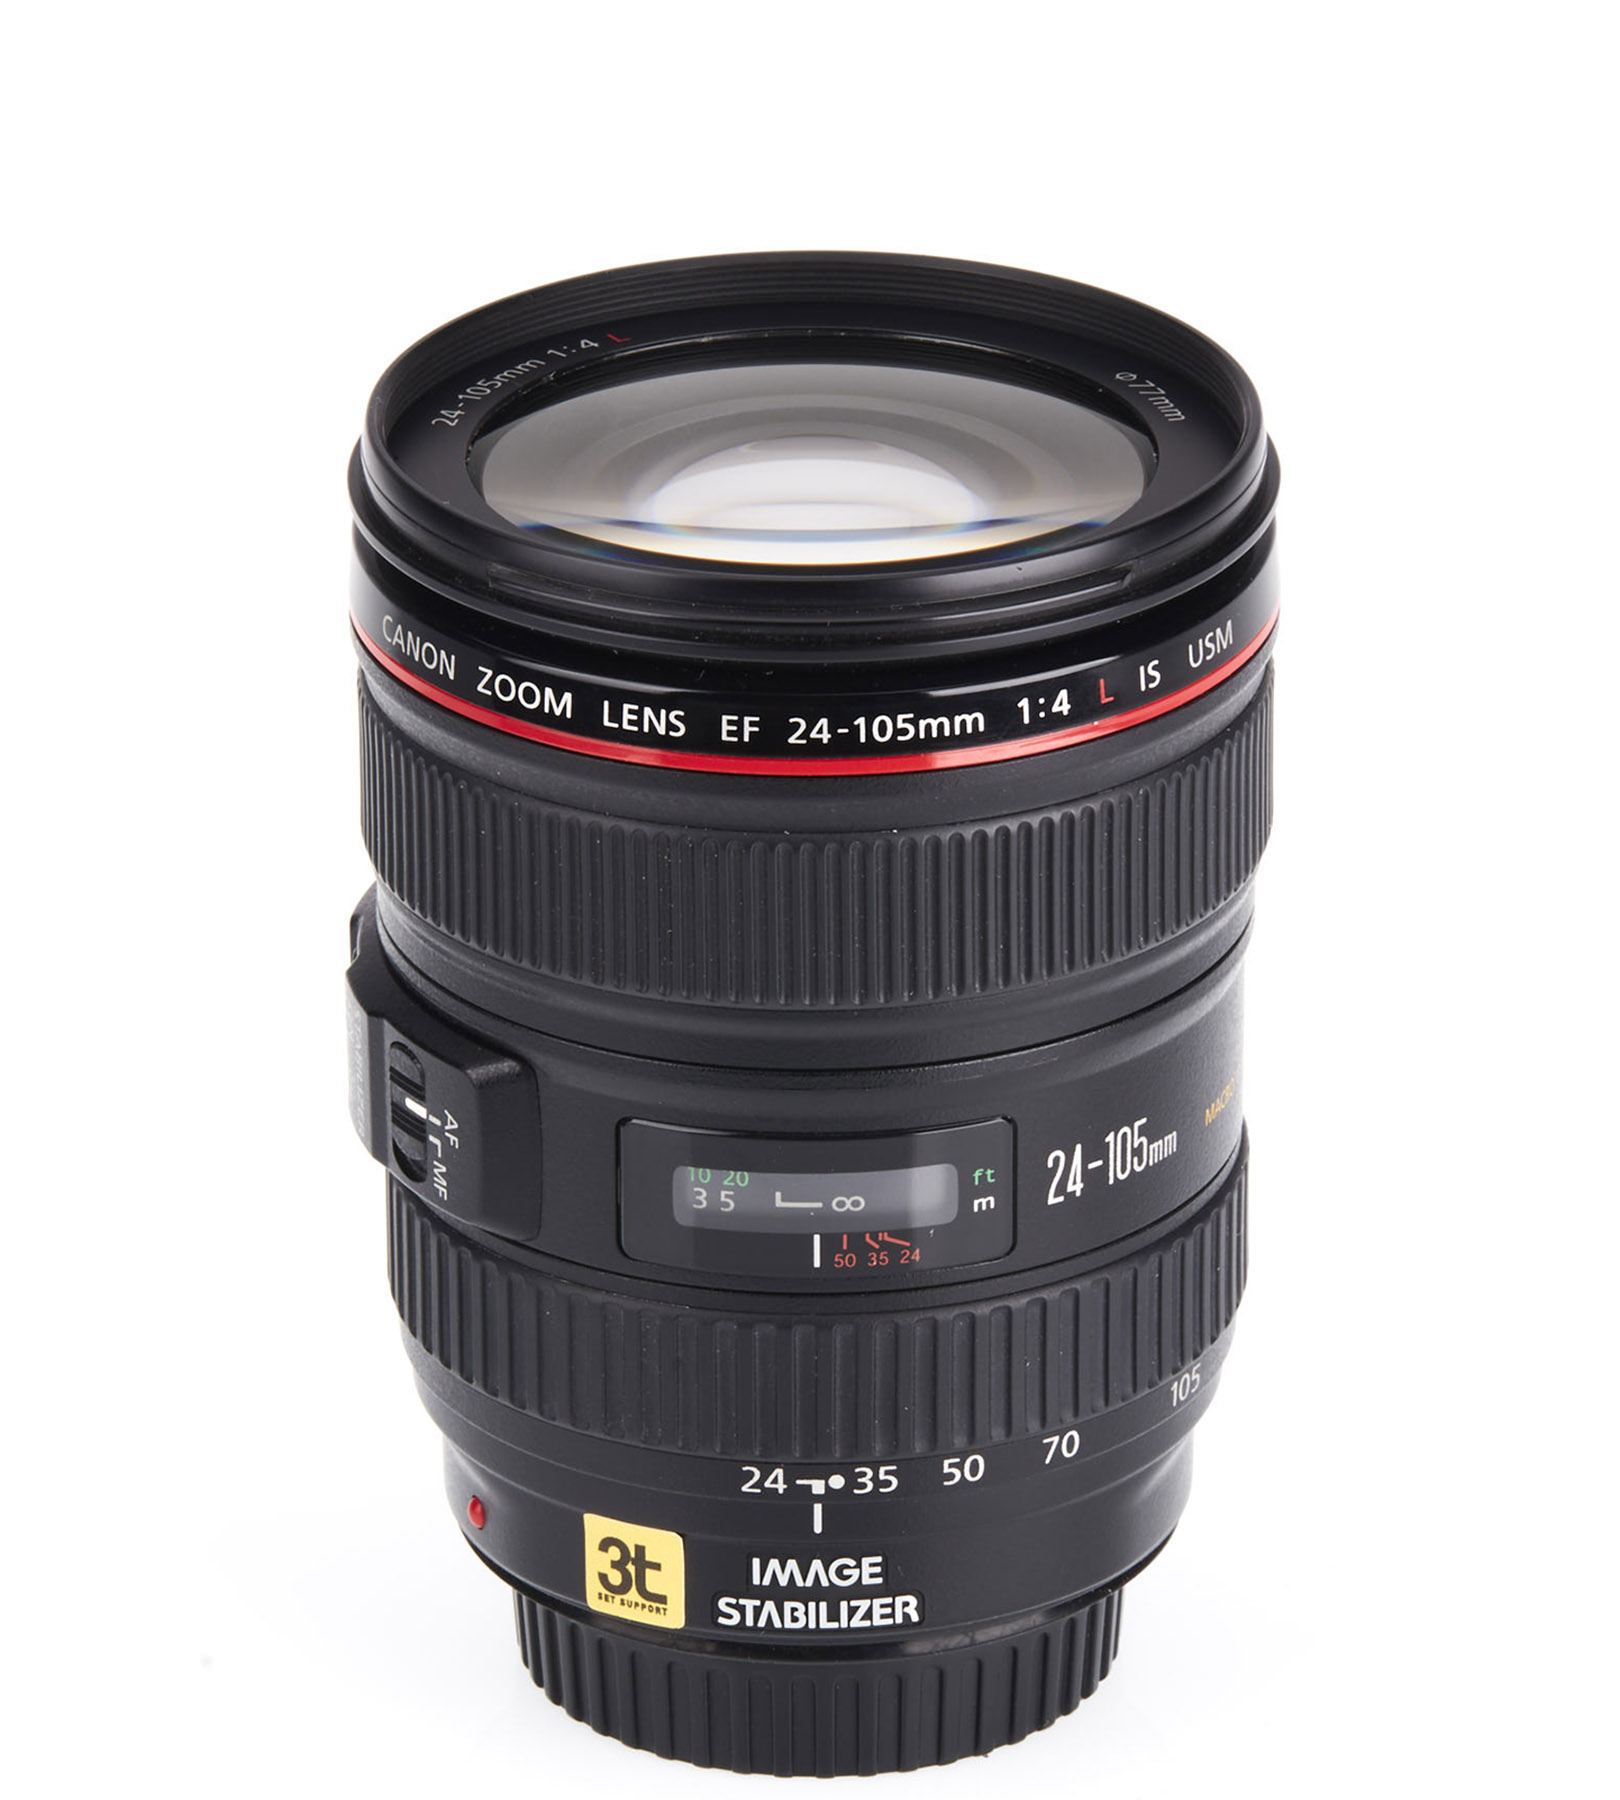 Lente Canon EF 24-105mm F/4 L IS USM